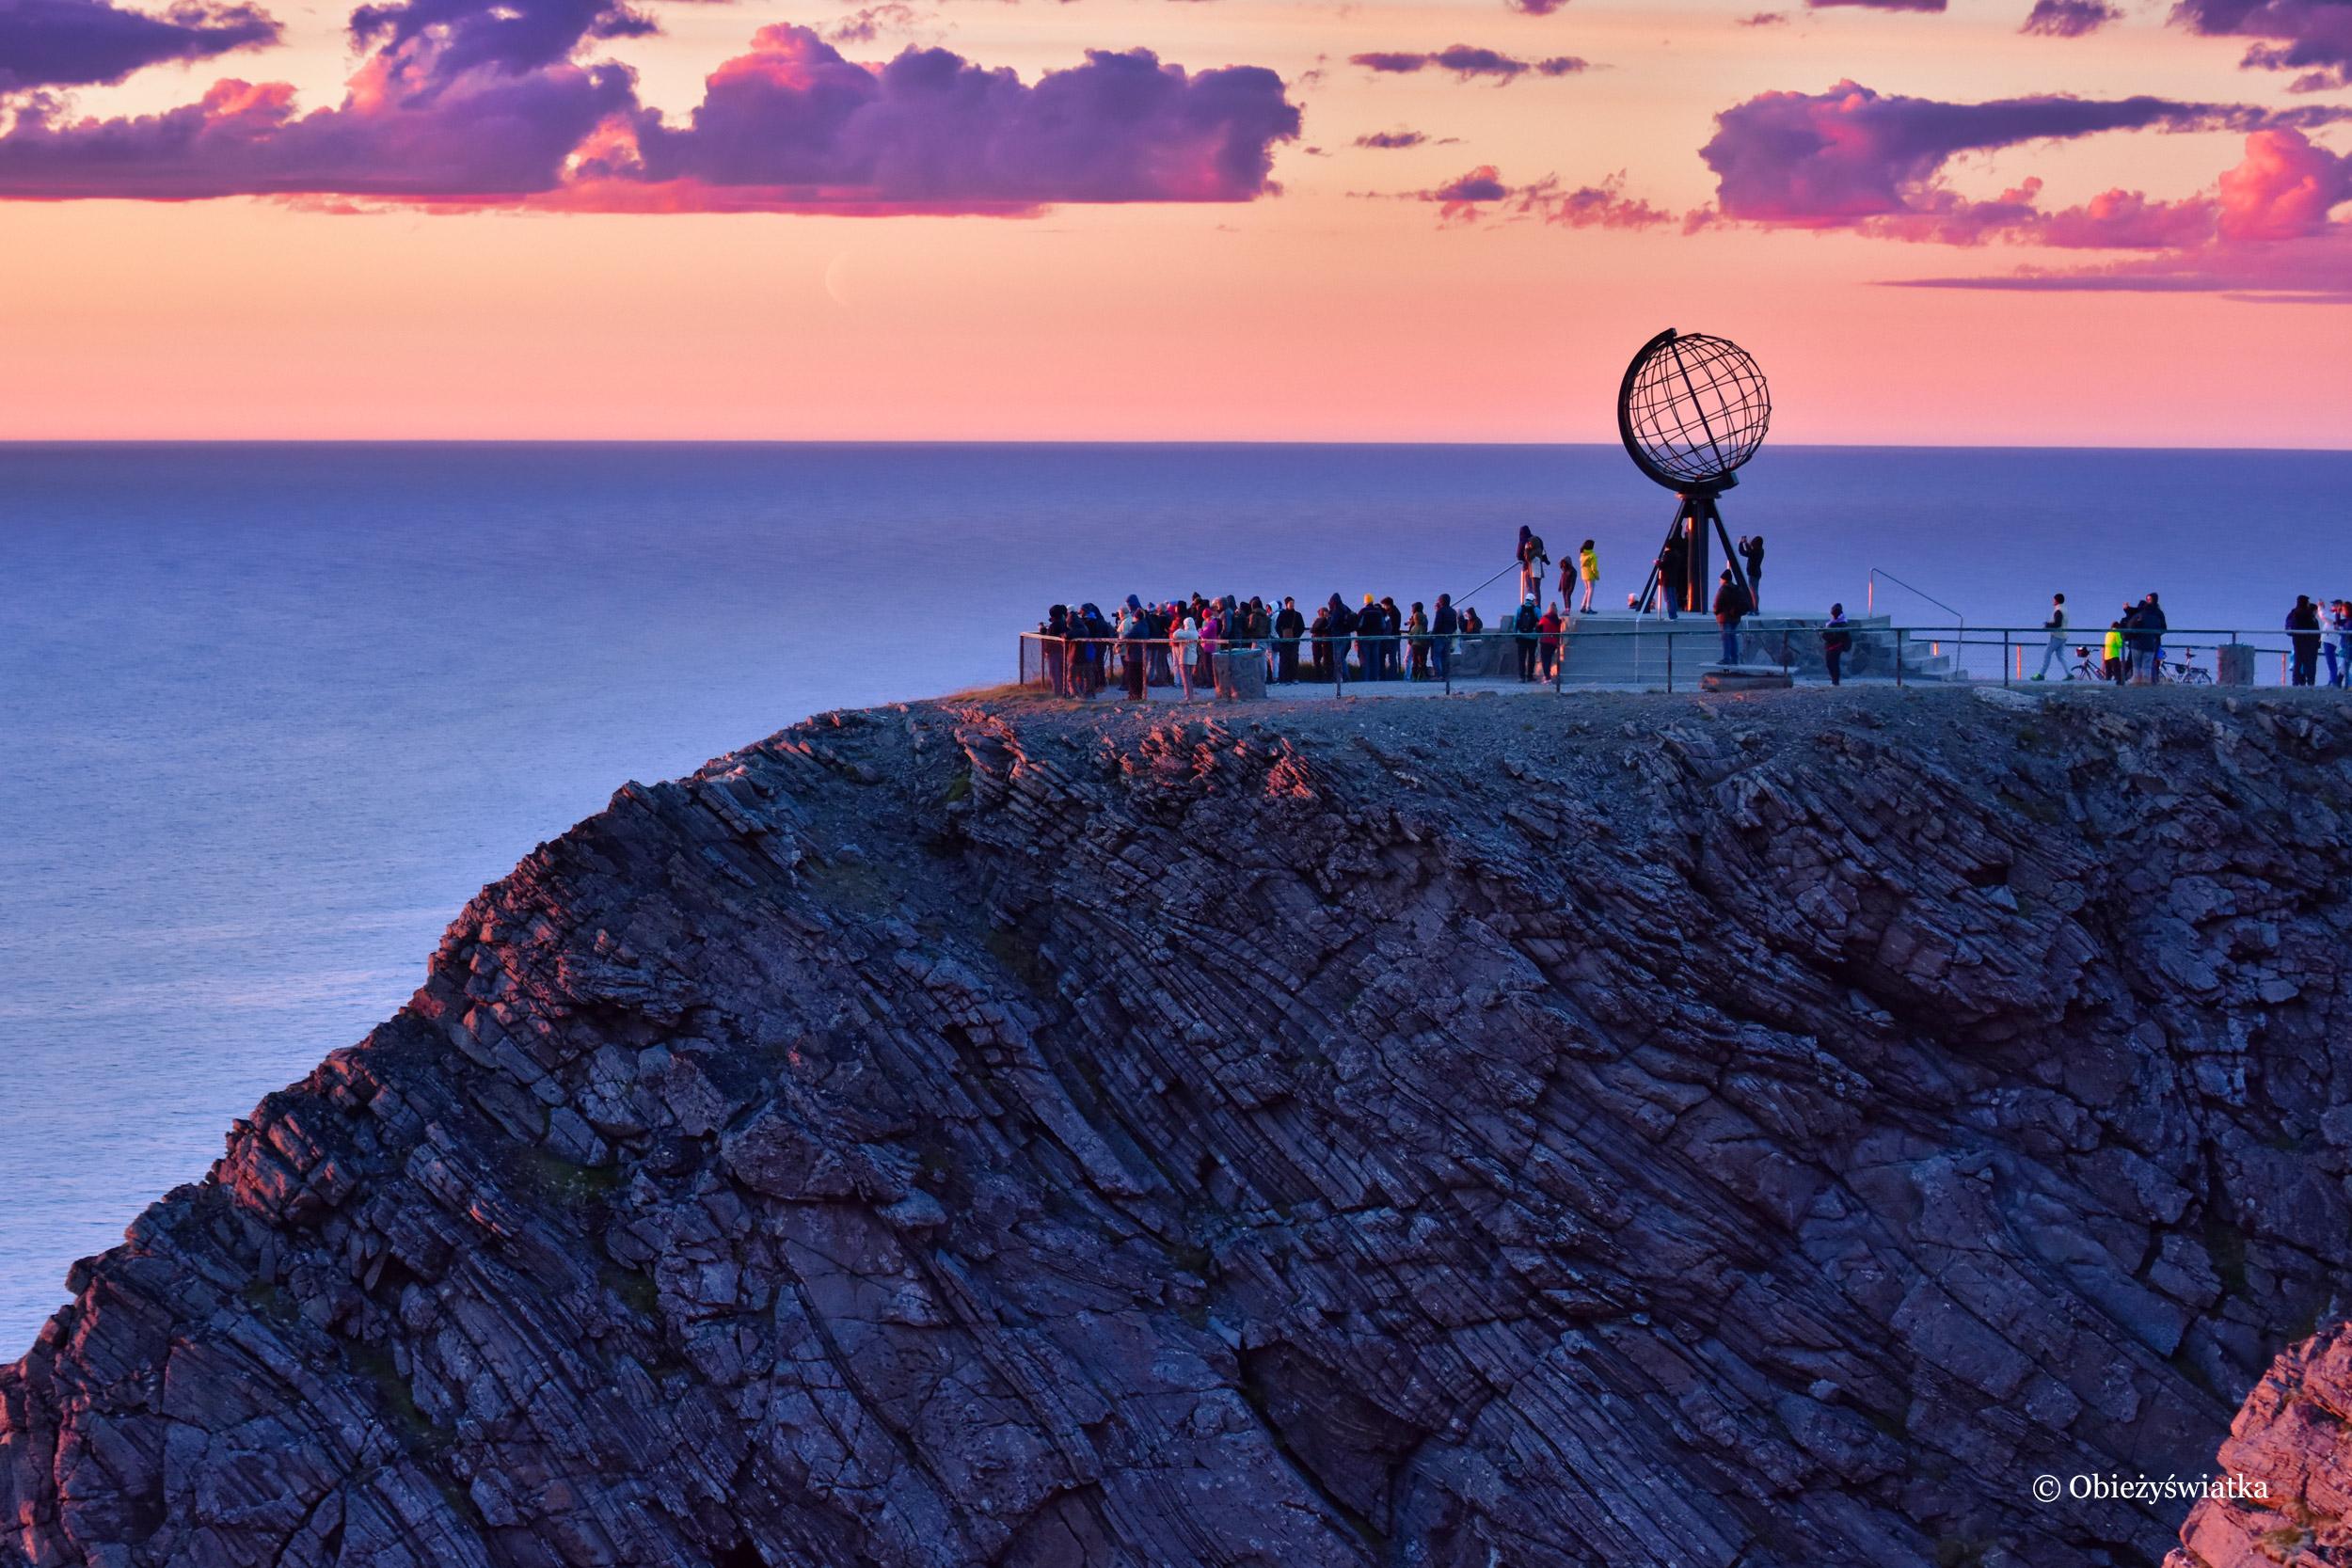 W stronę słońca, Nordkapp, Norwegia